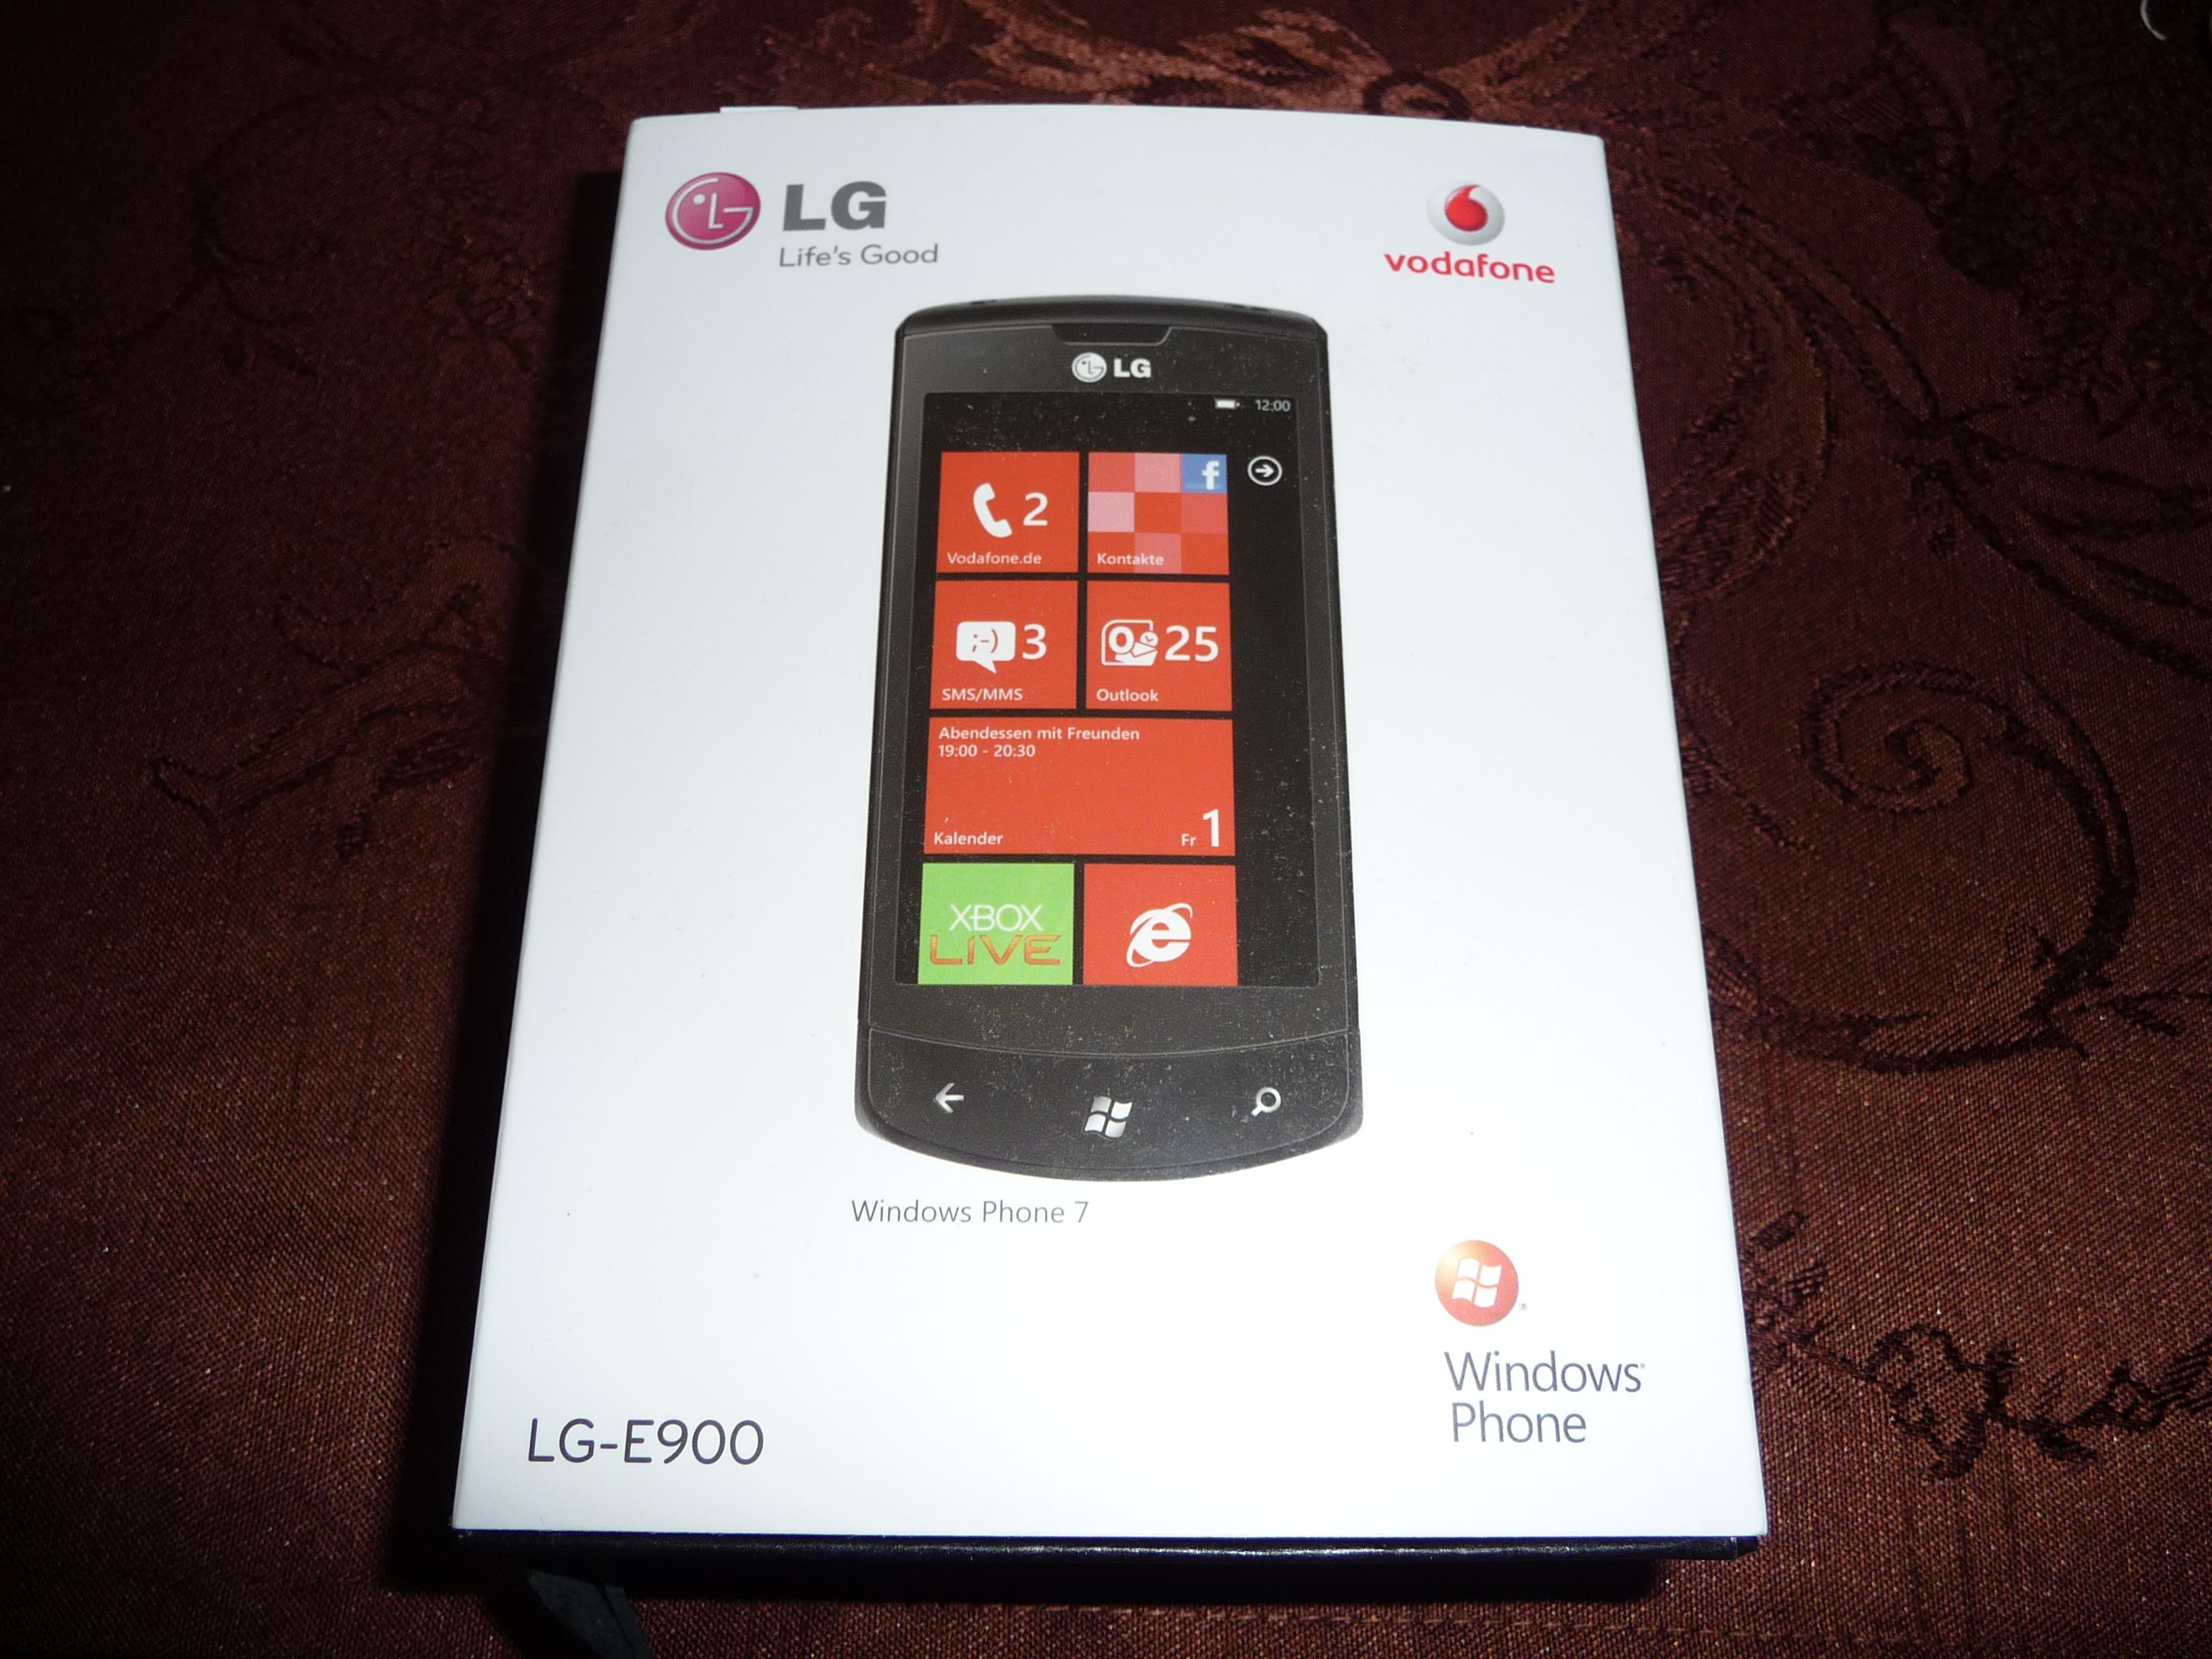 verkaufe lg e900 windows 7 phone neu ovp garantie. Black Bedroom Furniture Sets. Home Design Ideas